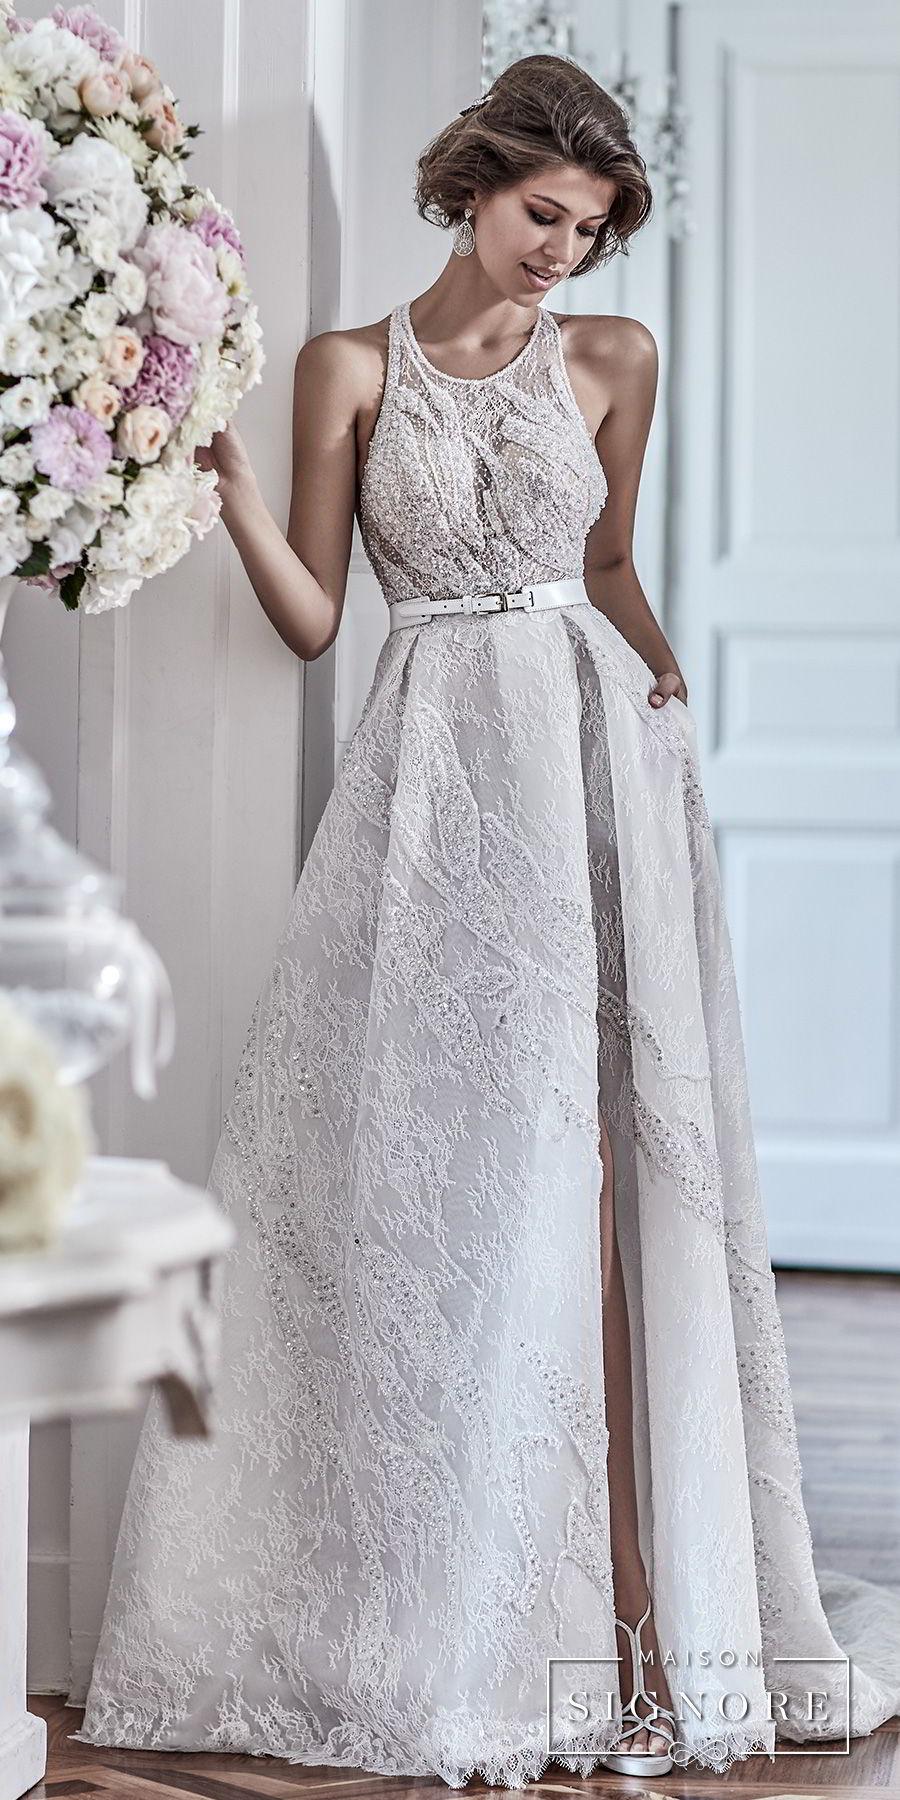 maison signore 2018 bridal sleeveless halter jewel neck full embellishment elegant a line wedding dress with pocket cross strap back chapel train (demy) mv fv